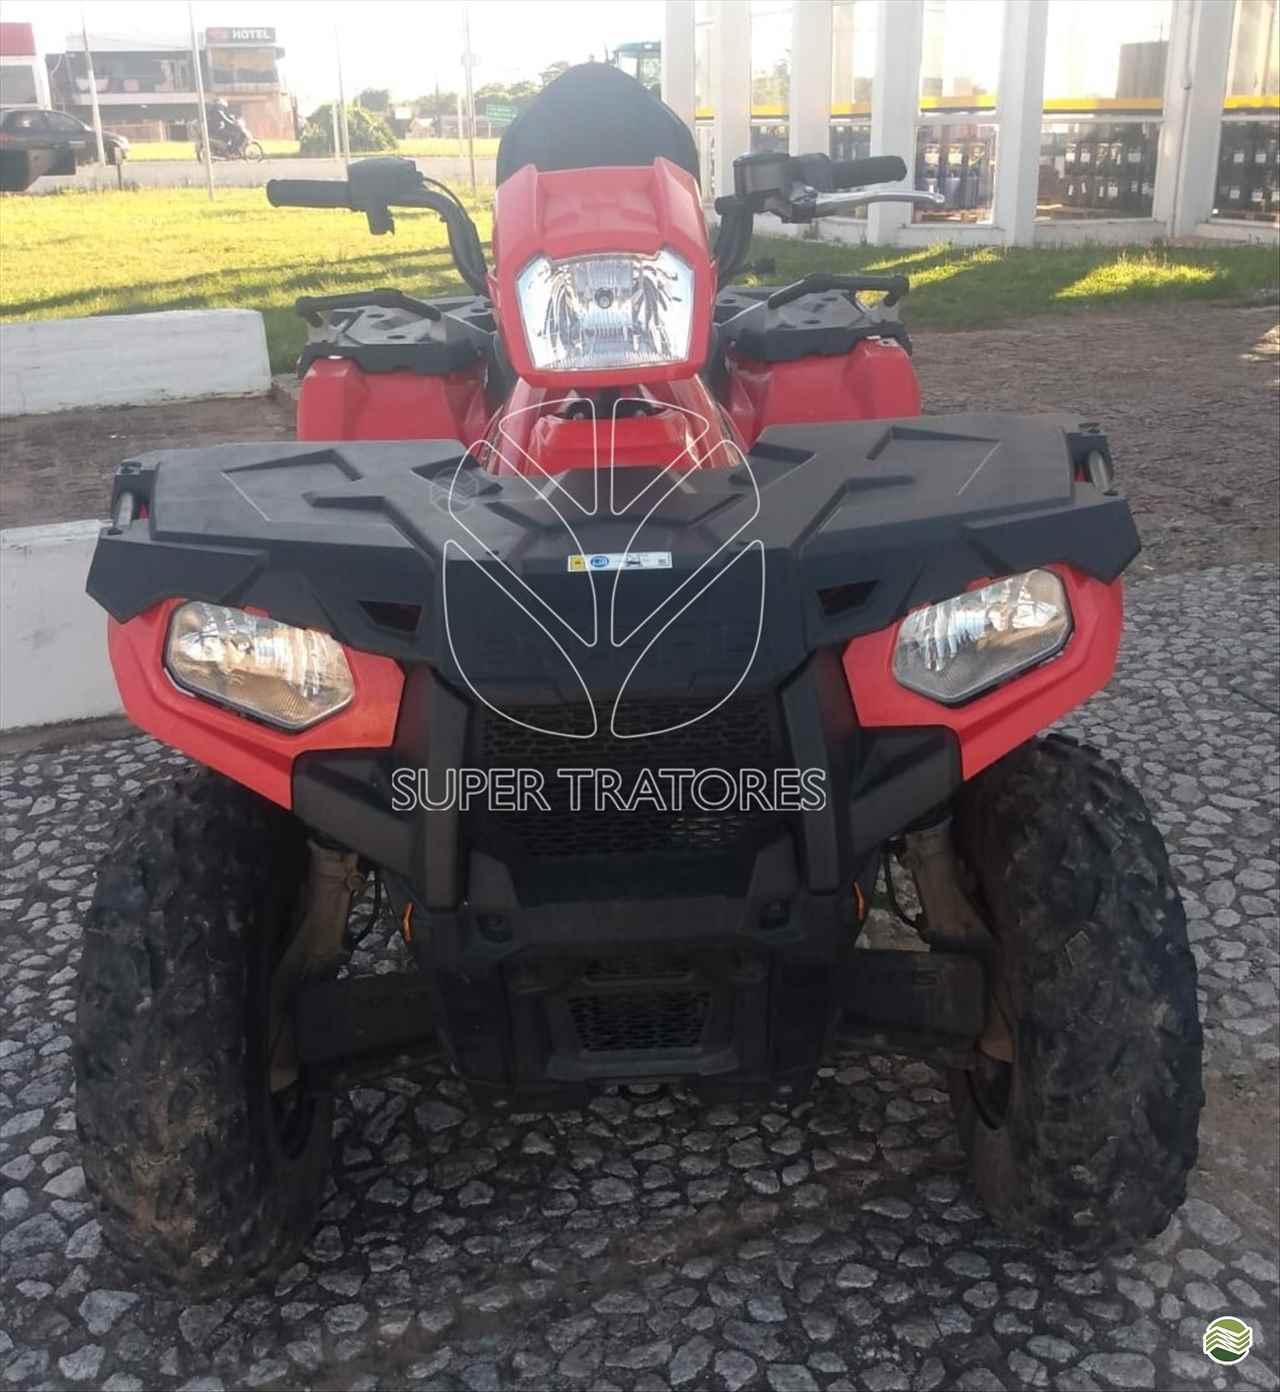 QUADRICICLO POLARIS SPORTSMAN 570 Super Tratores - New Holland - Matriz SANTA MARIA RIO GRANDE DO SUL RS